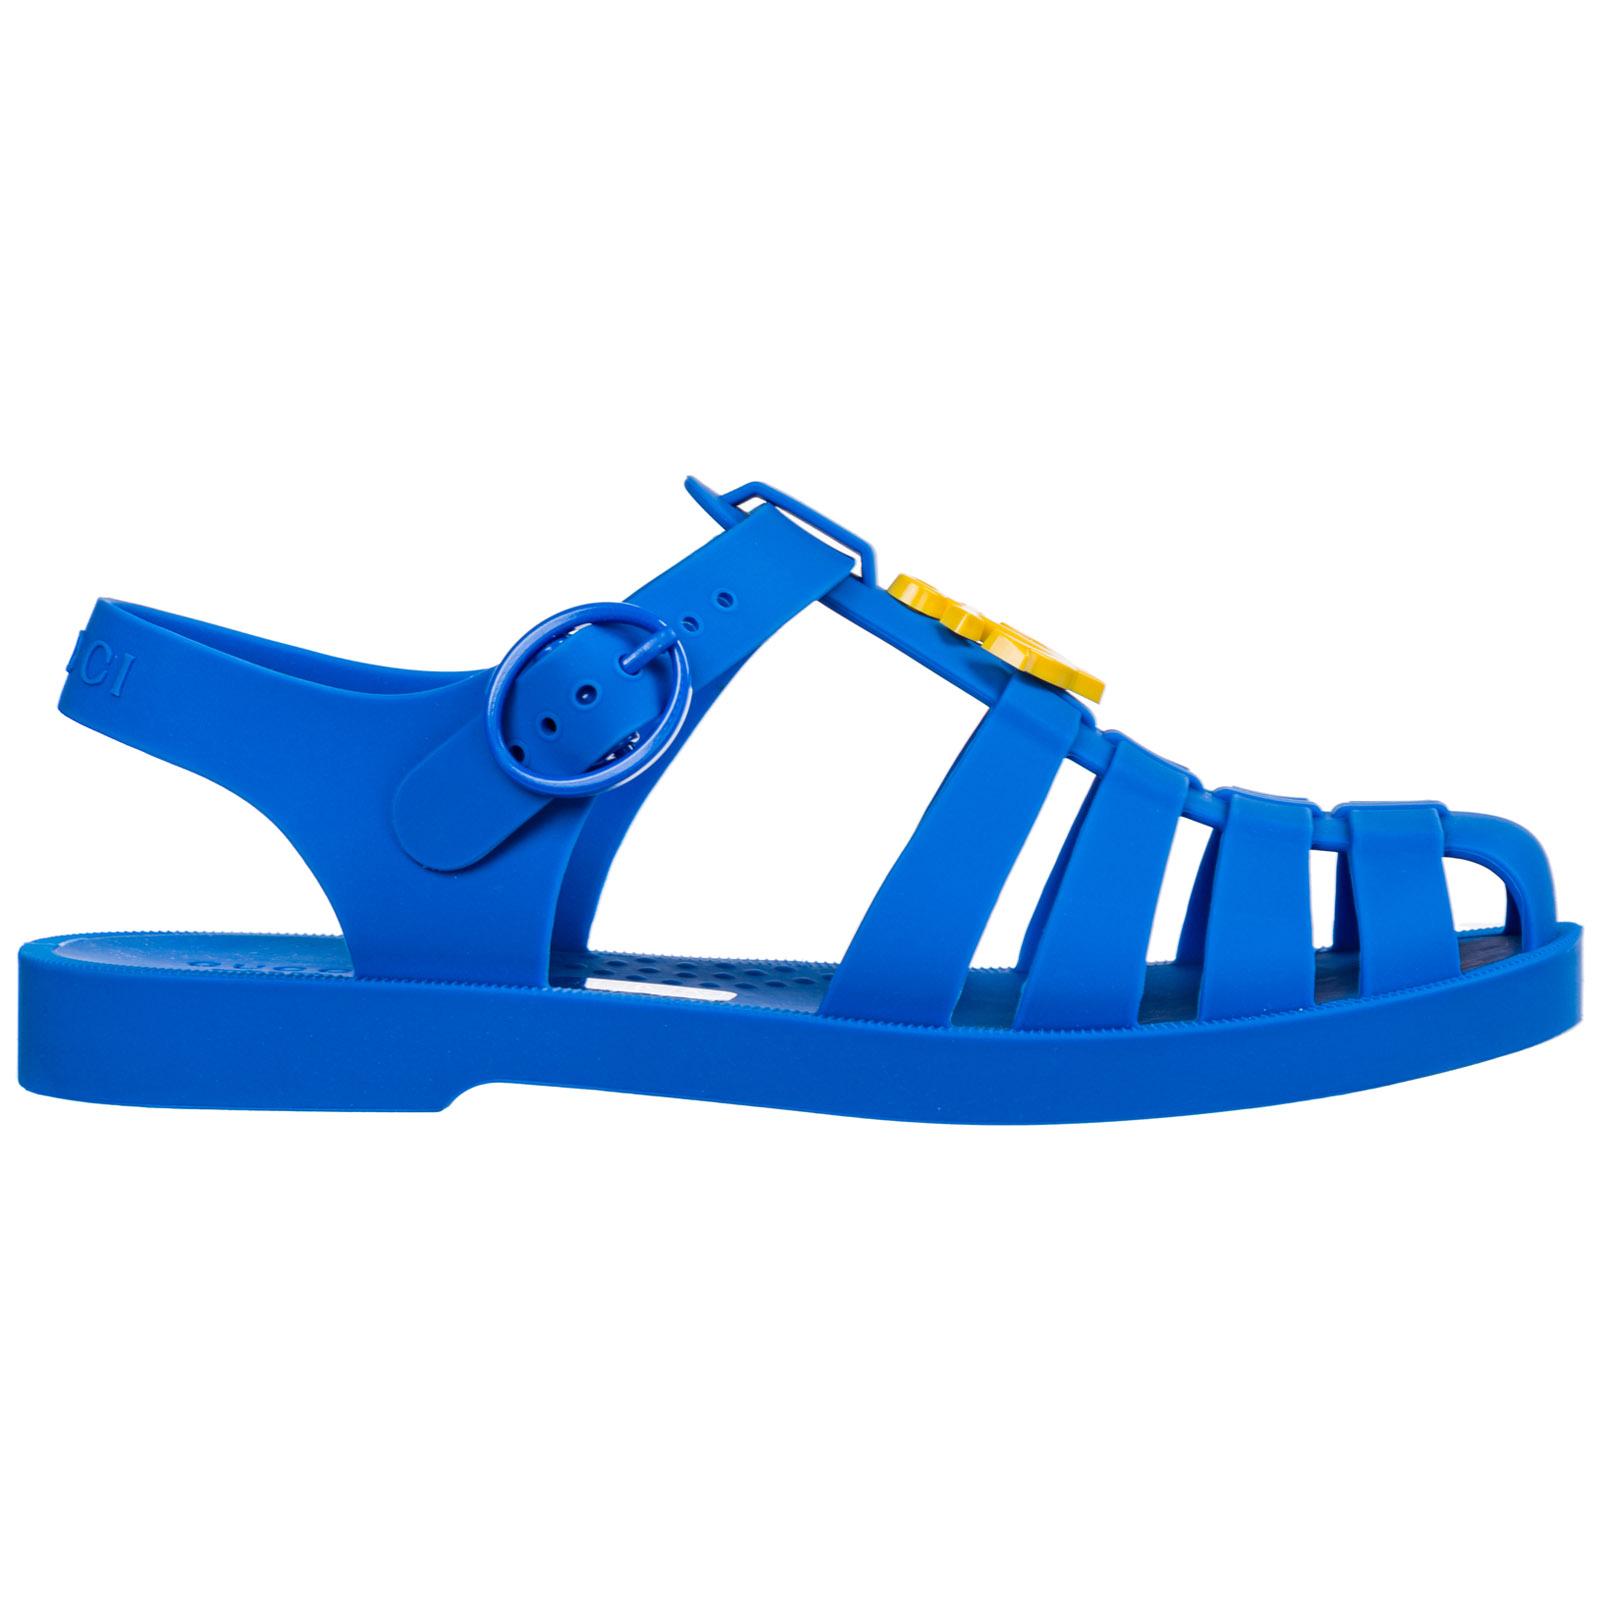 wholesale dealer d885d 97c8a Sandali Bimbo Bambino in Blue